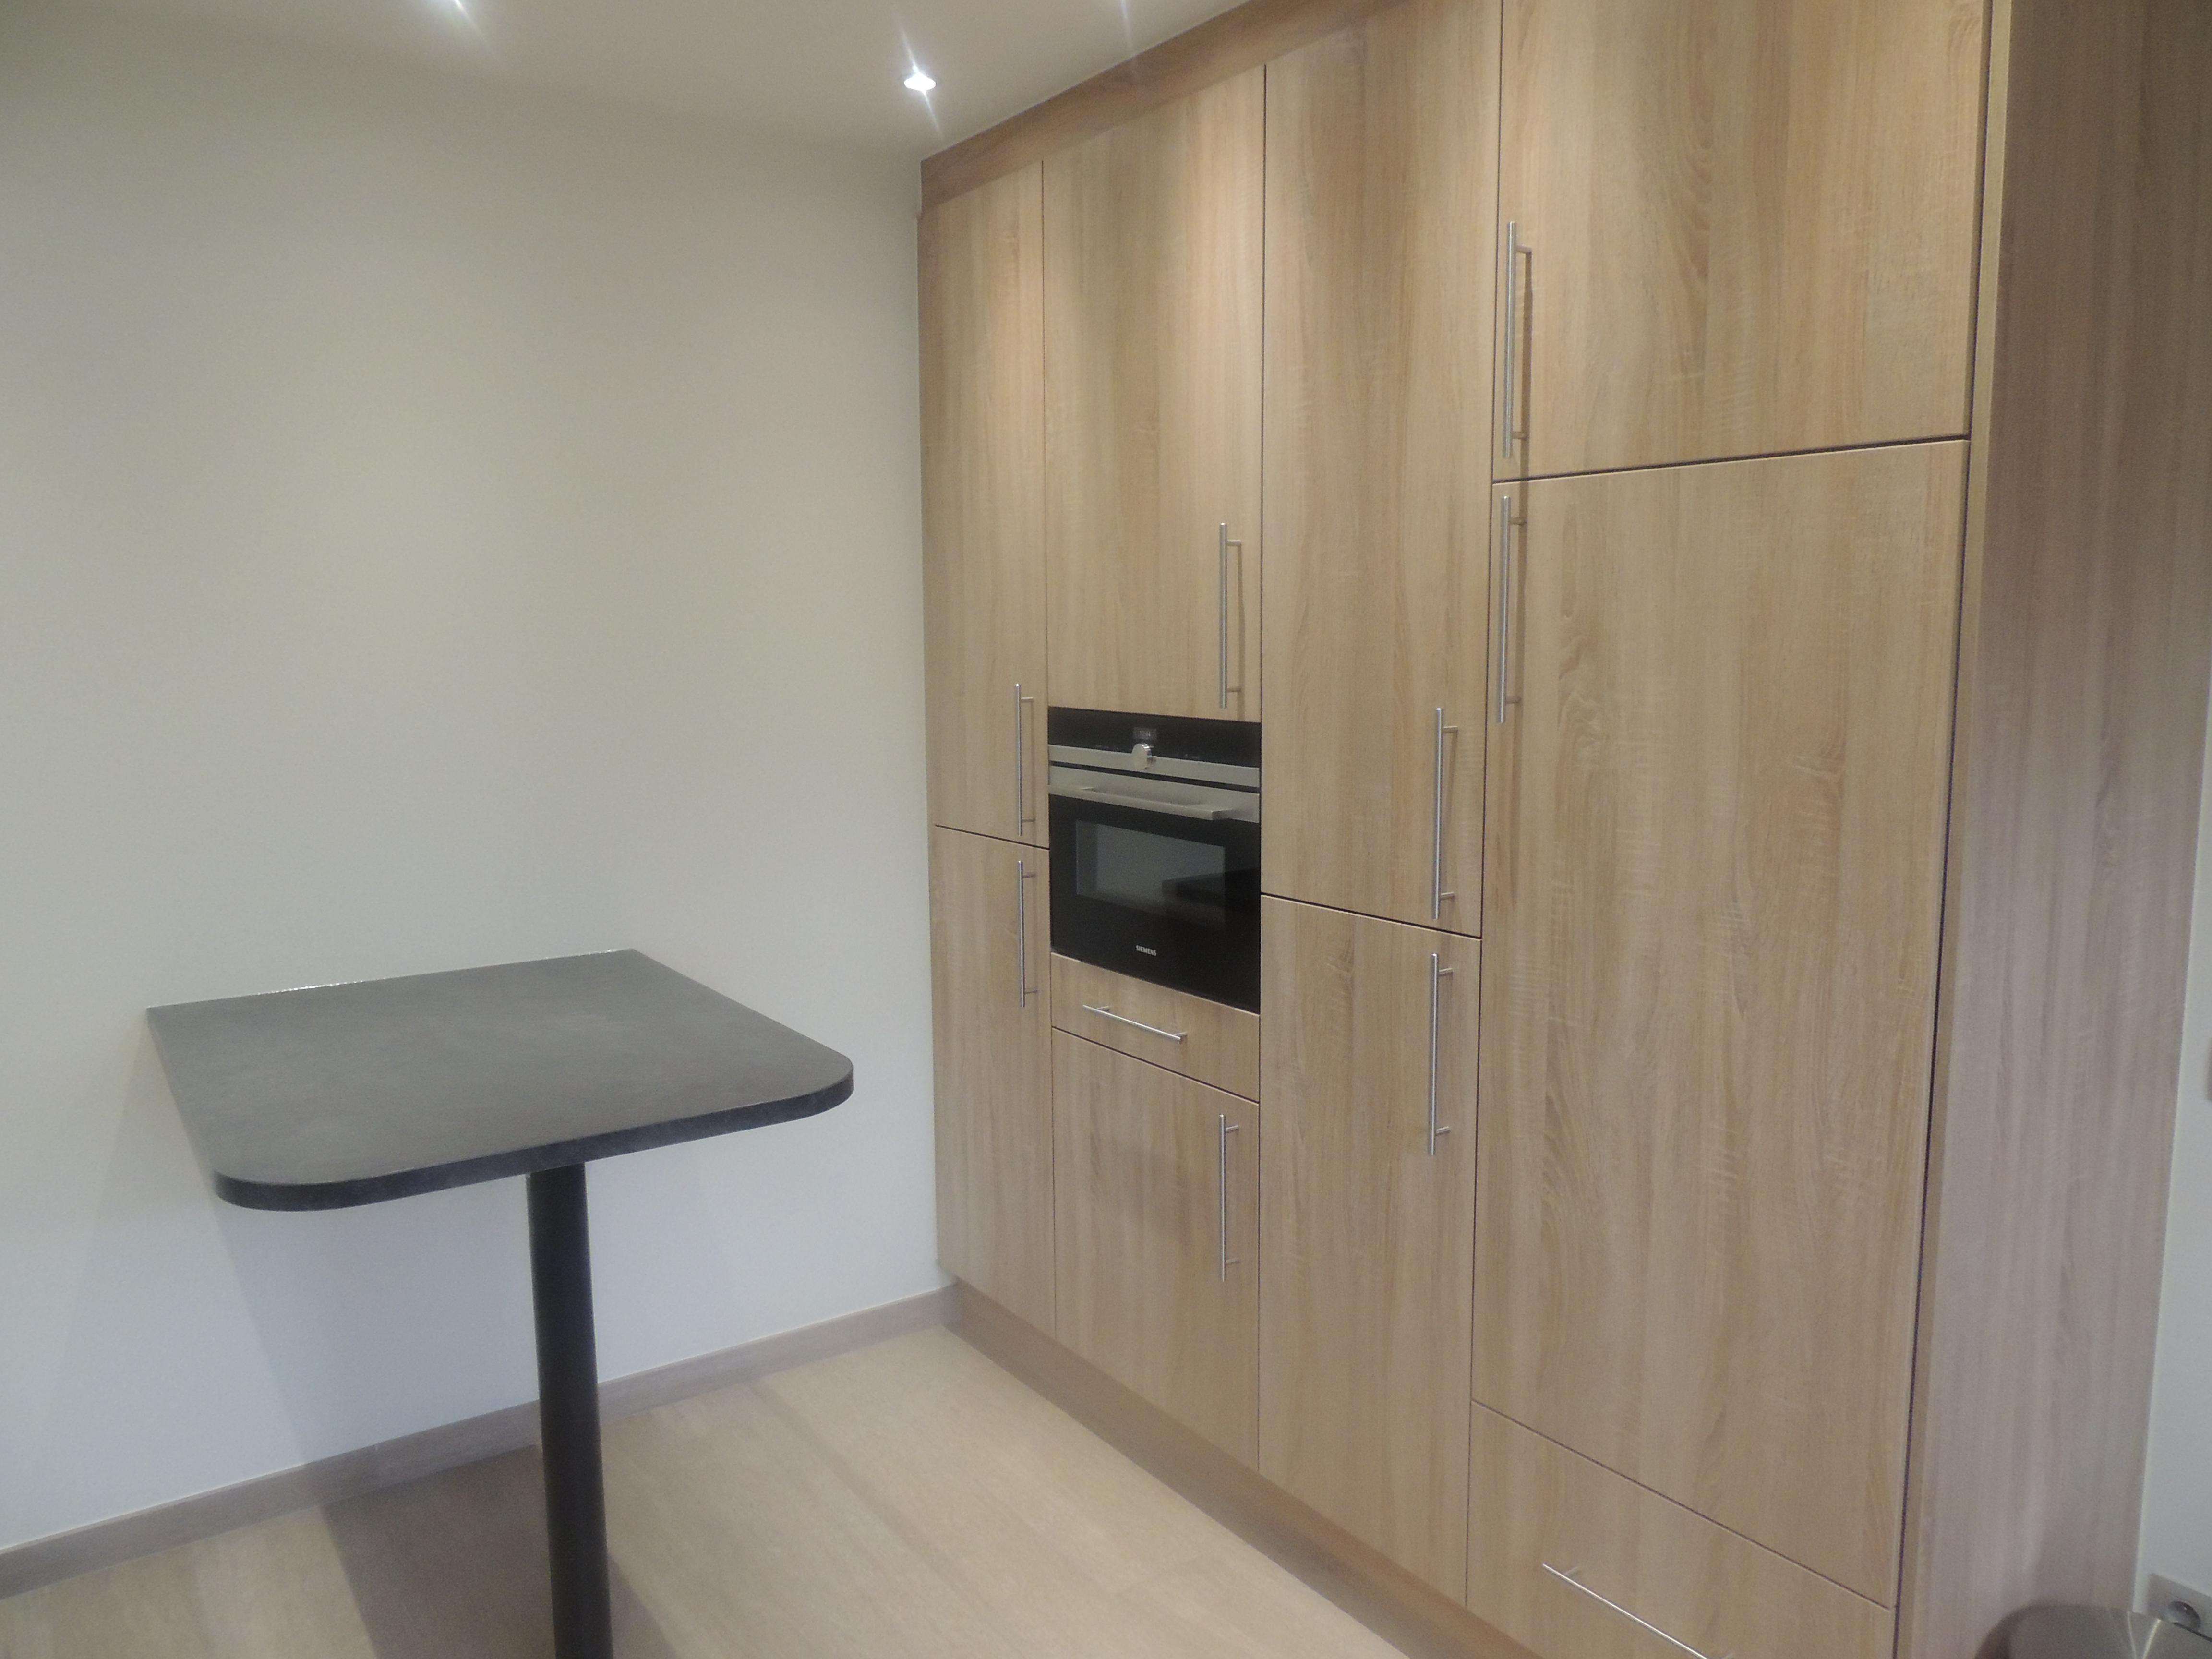 Keuken bruin 4